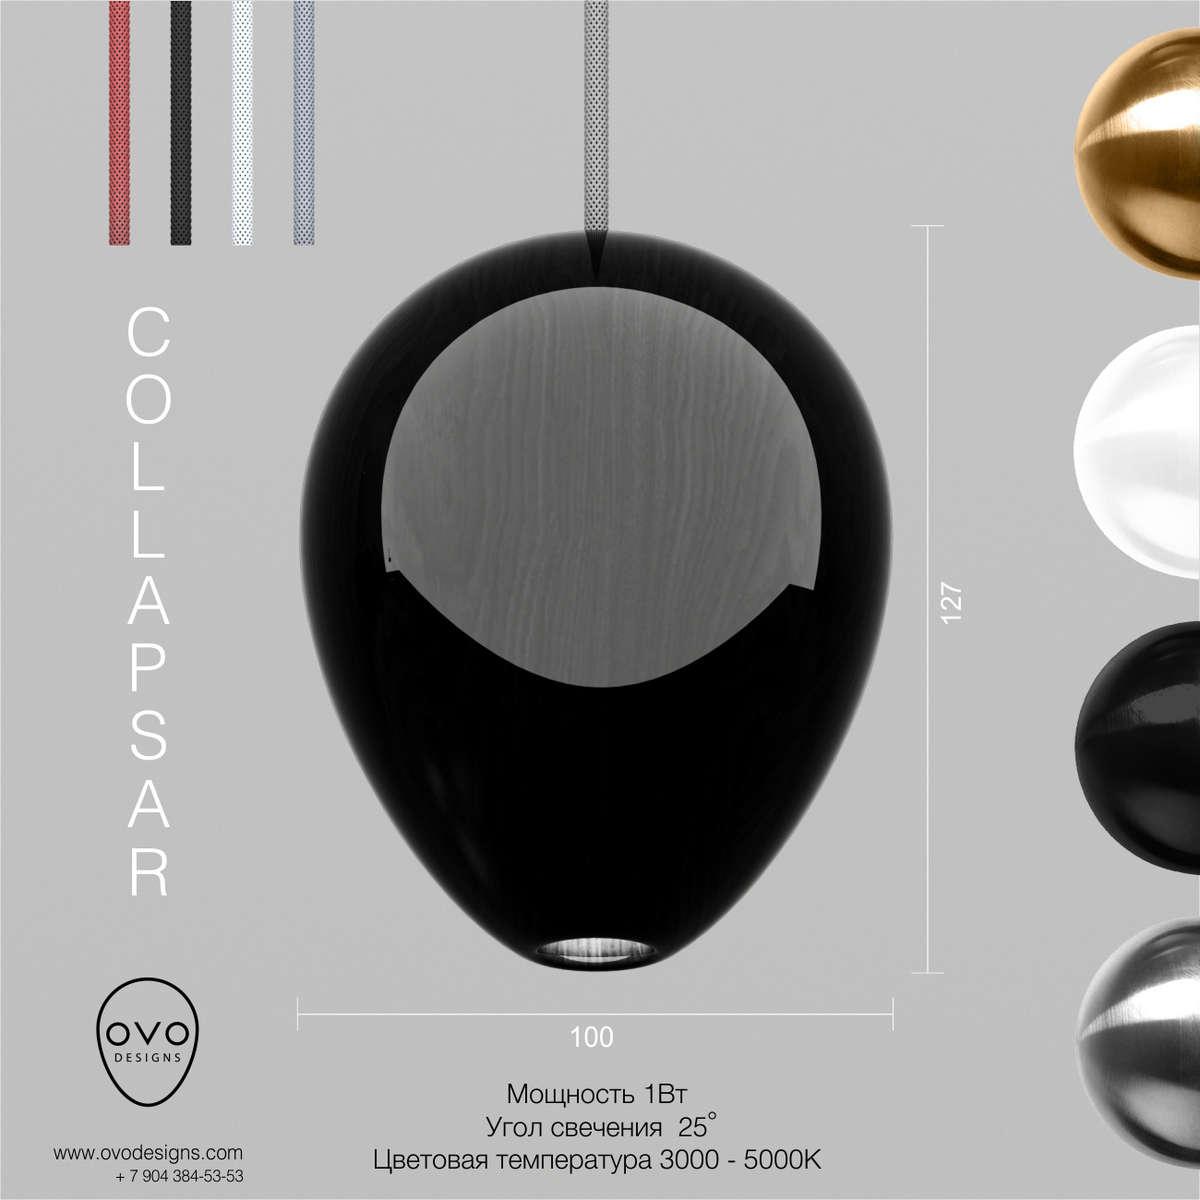 Светильник GOLLAPSAR Коллекция OVO OVO-COLLAPSAR-1W-2700K-25Deg